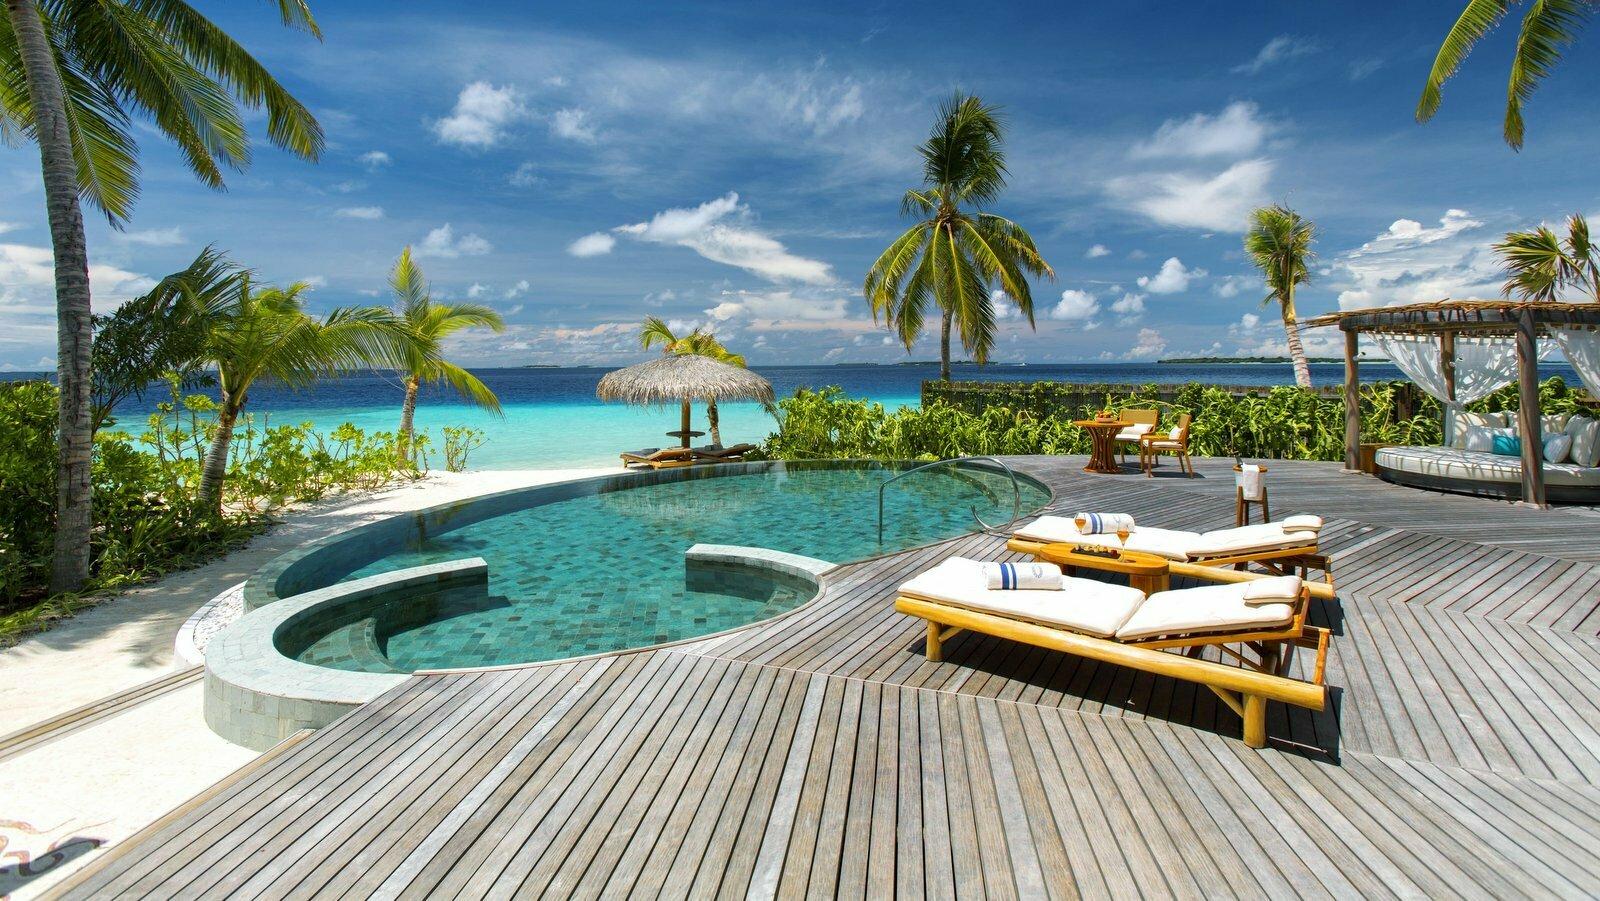 Мальдивы, отель Milaidhoo Island Maldives, номер Beach Residence